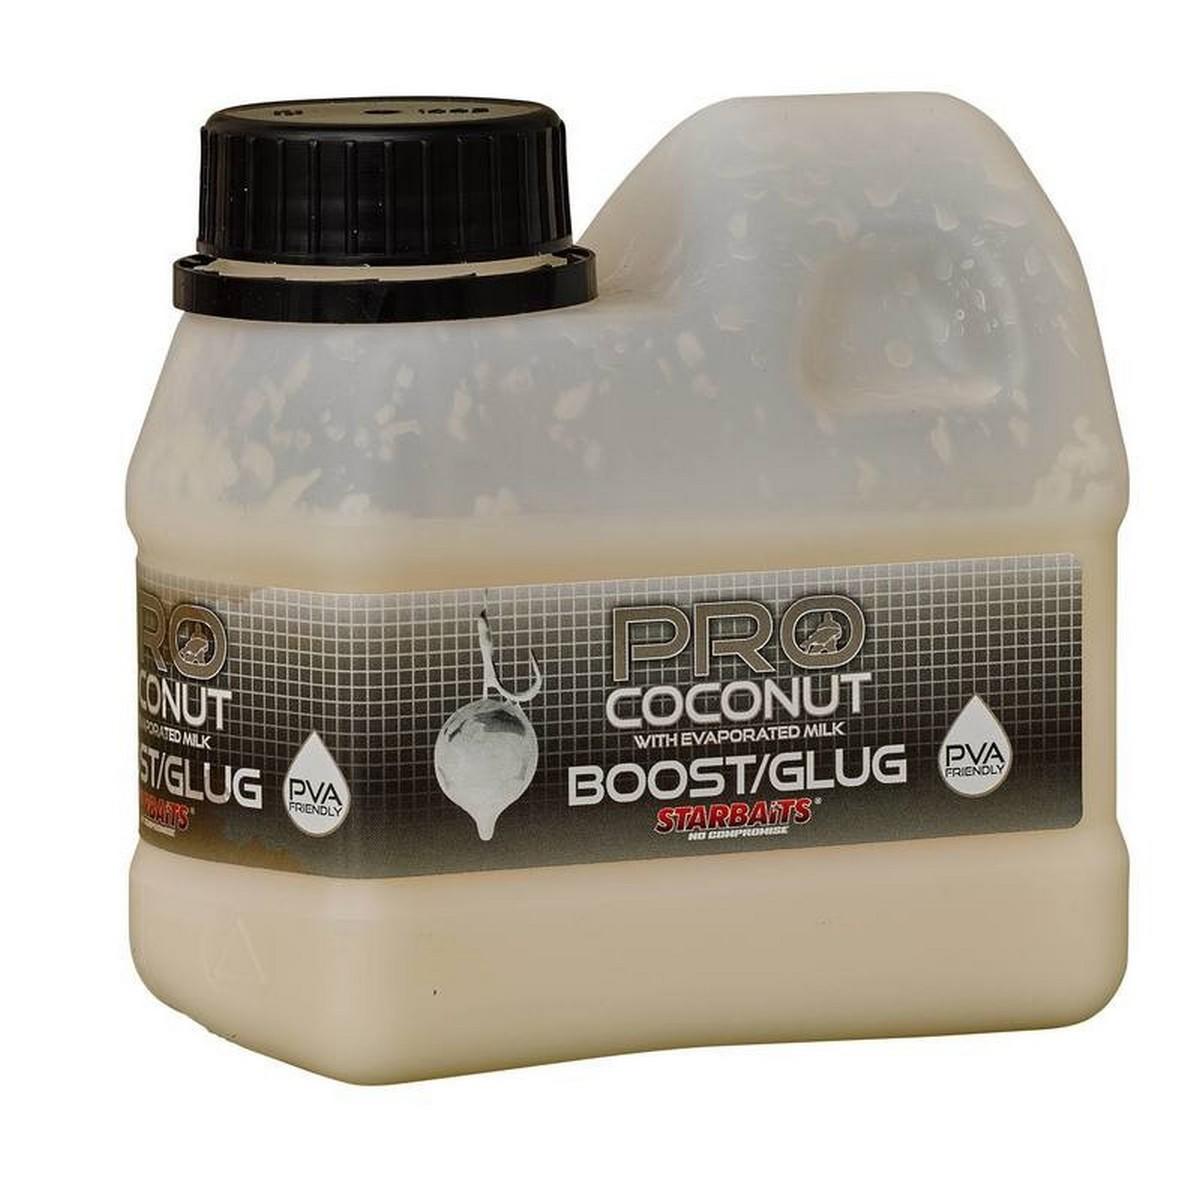 Dip StarBaits Probiotic Coconut Boost Glug